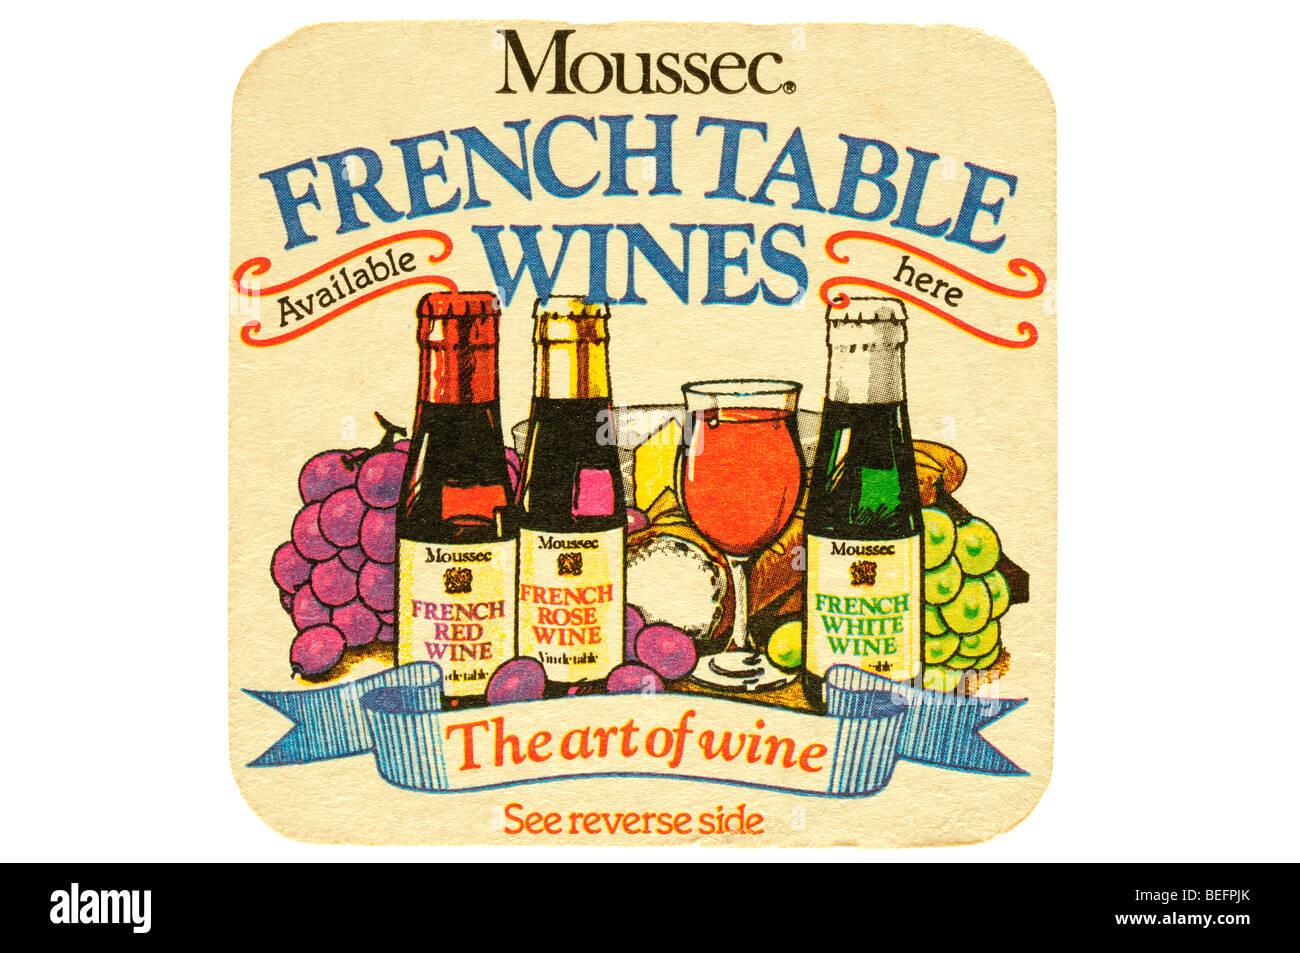 Moussec vini francesi disponibili qui l'arte del vino Immagini Stock